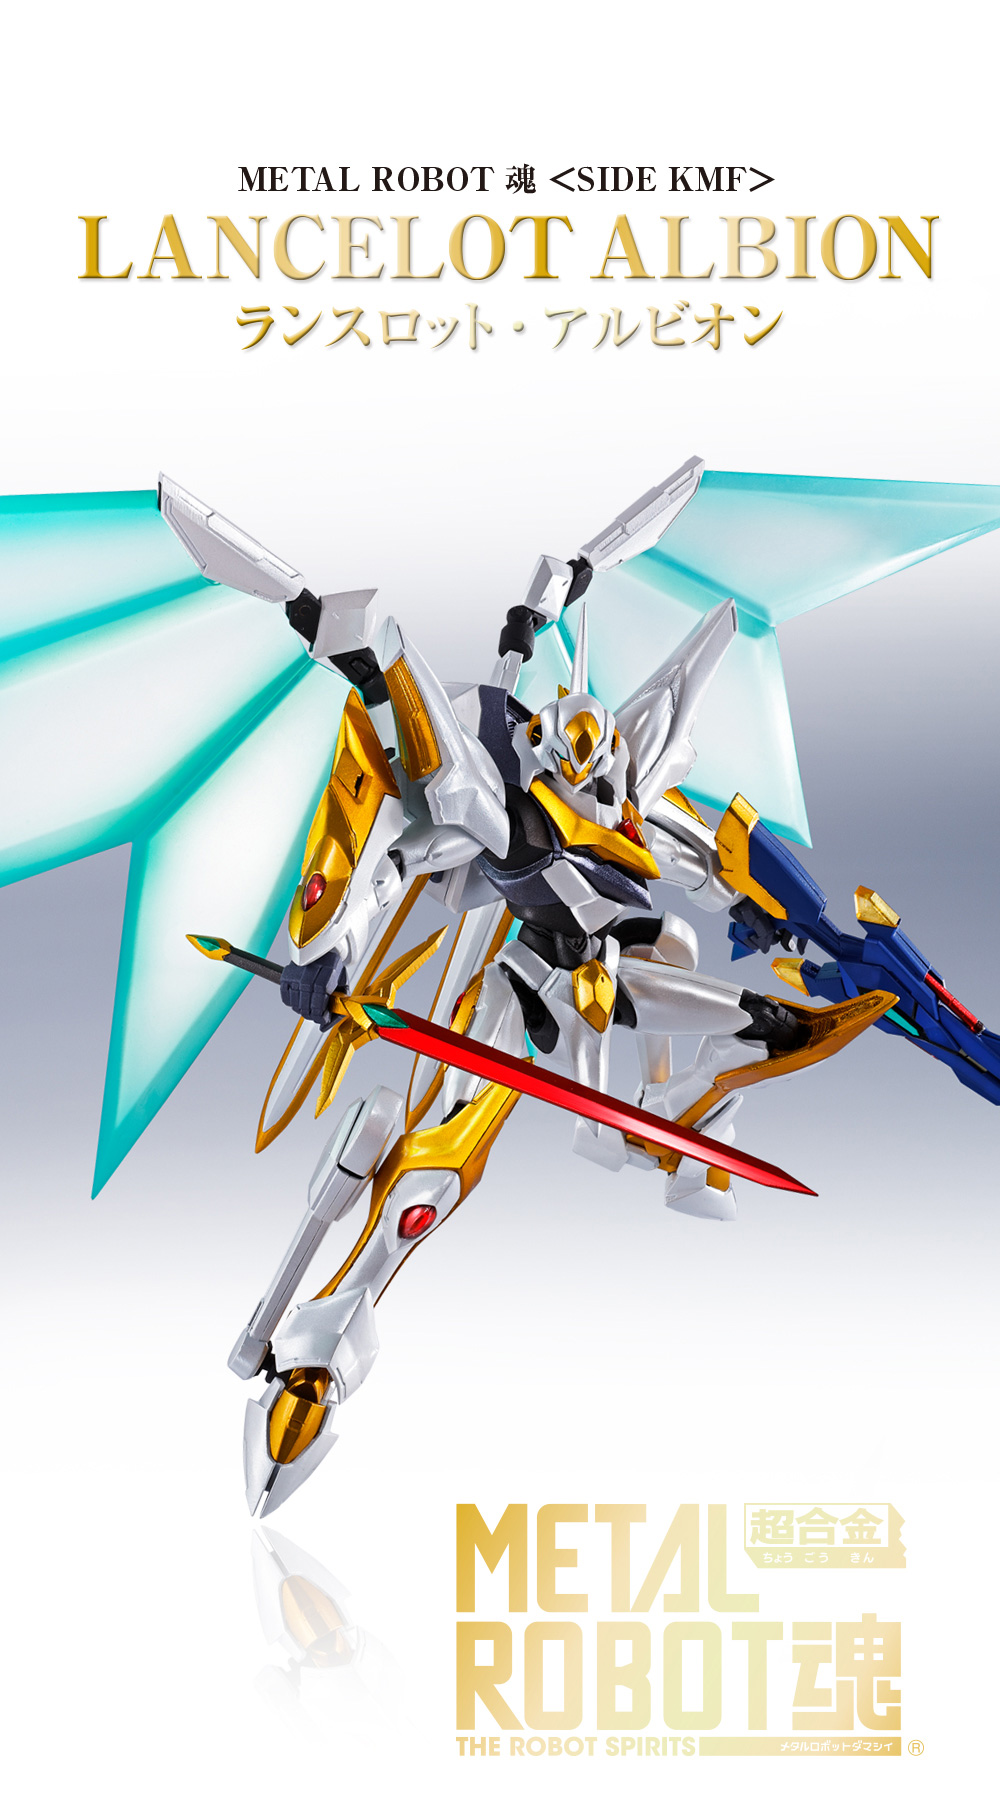 "Gundam : Code Geass - Metal Robot Side KMF ""The Robot Spirits"" (Bandai) - Page 2 UZOCjSSF_o"